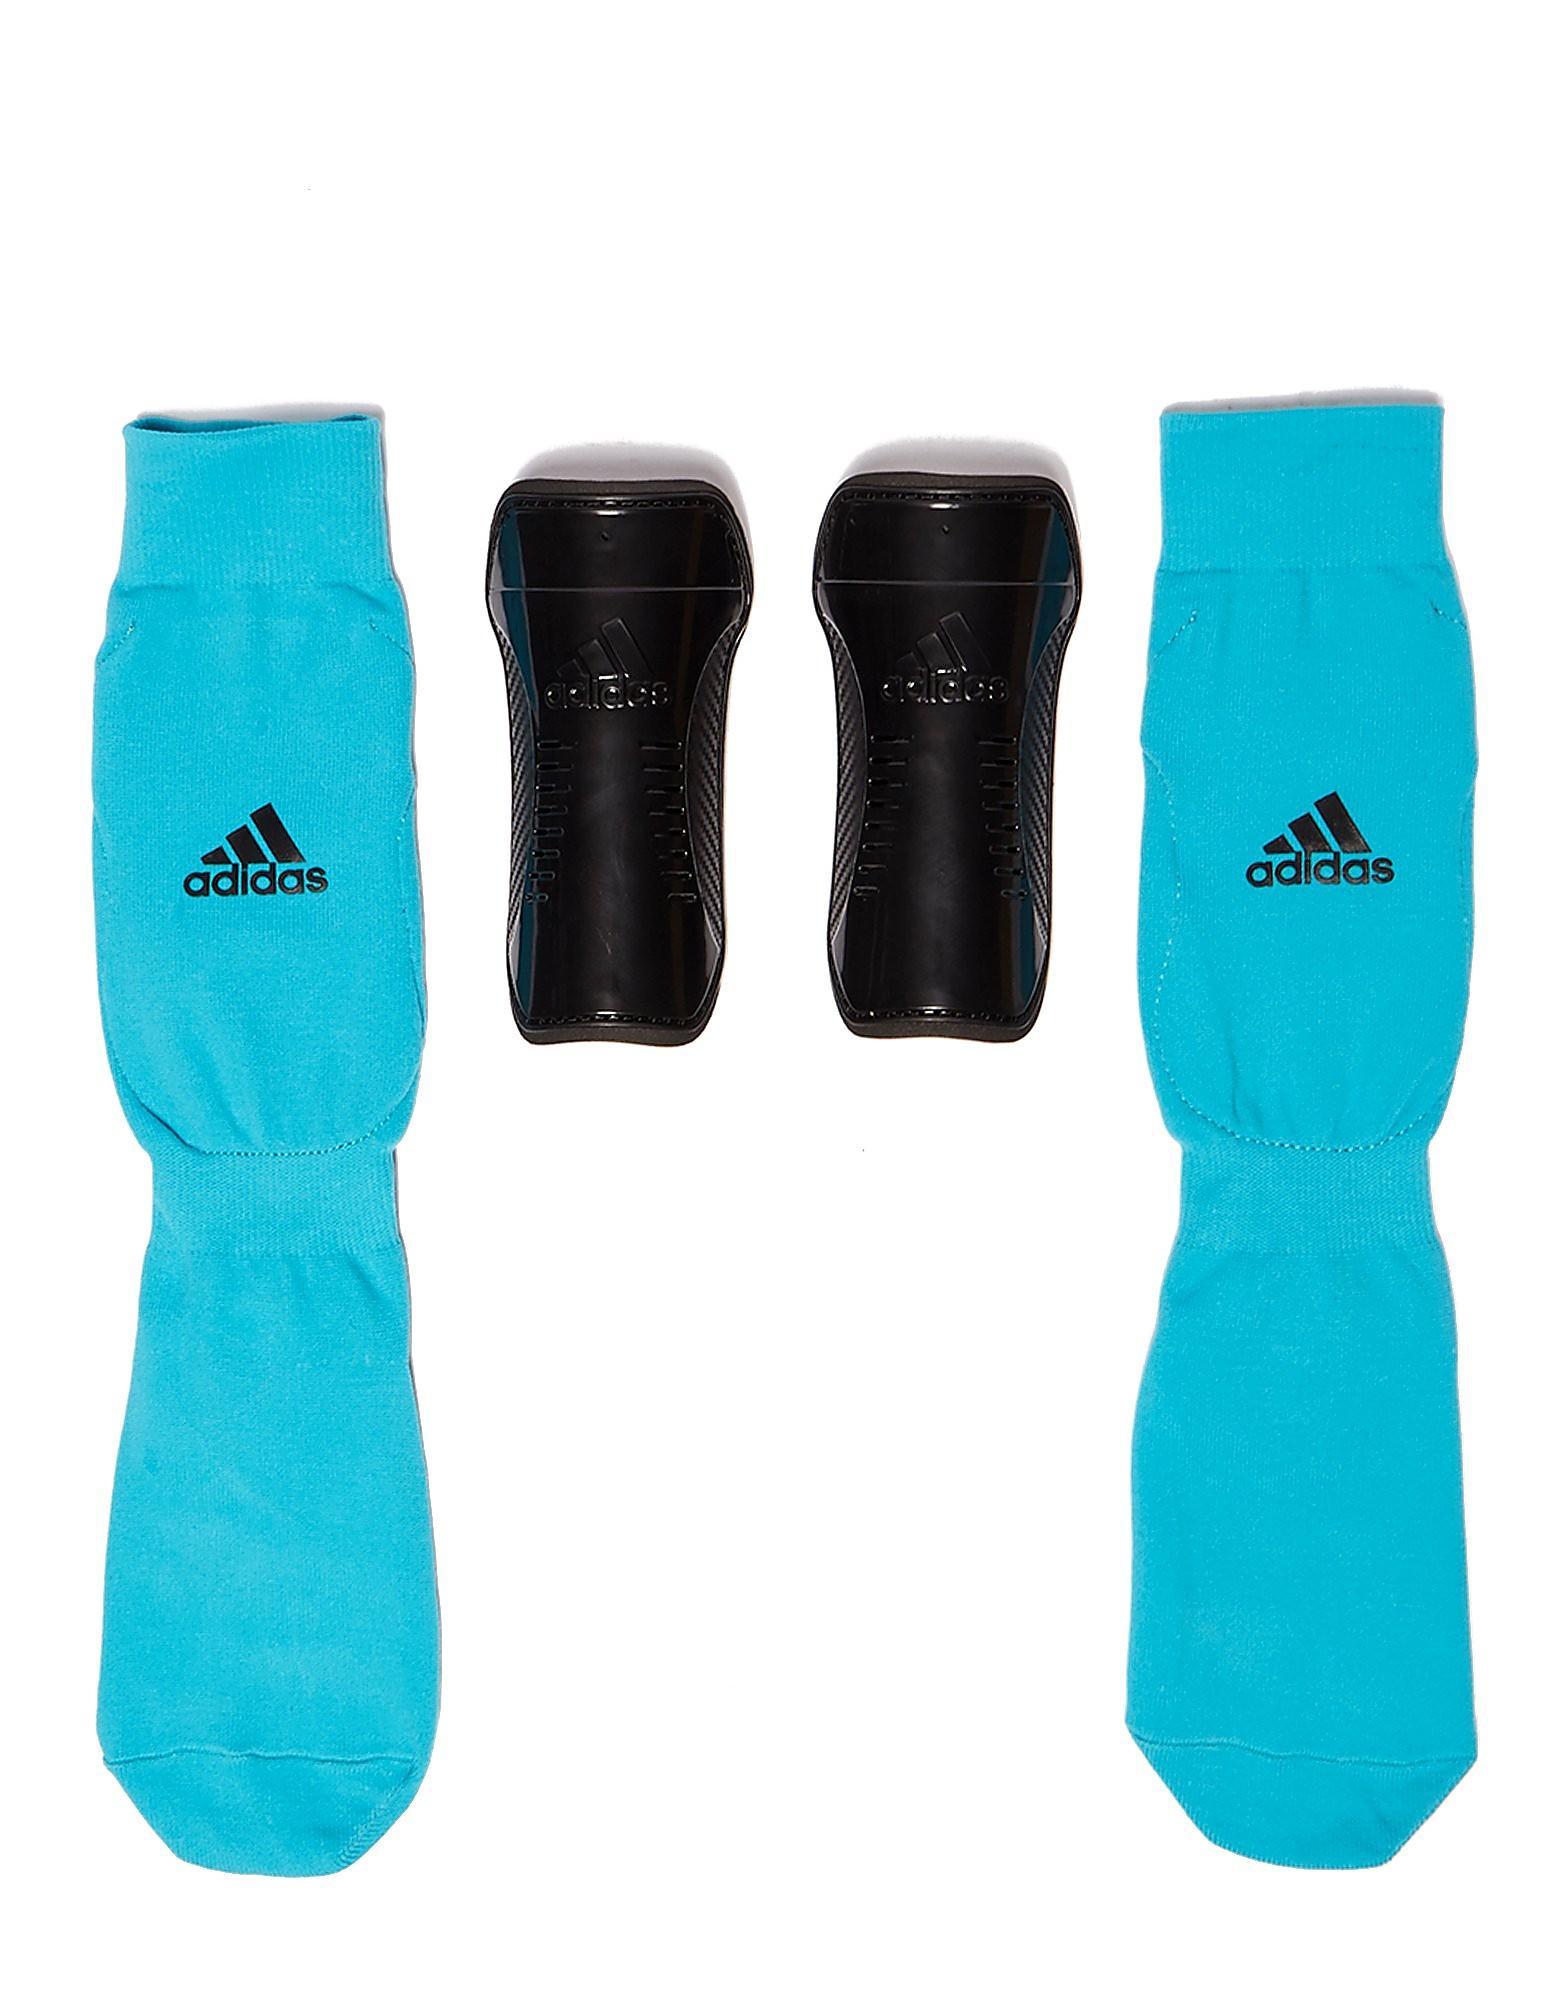 adidas Youth Sock Guard Junior